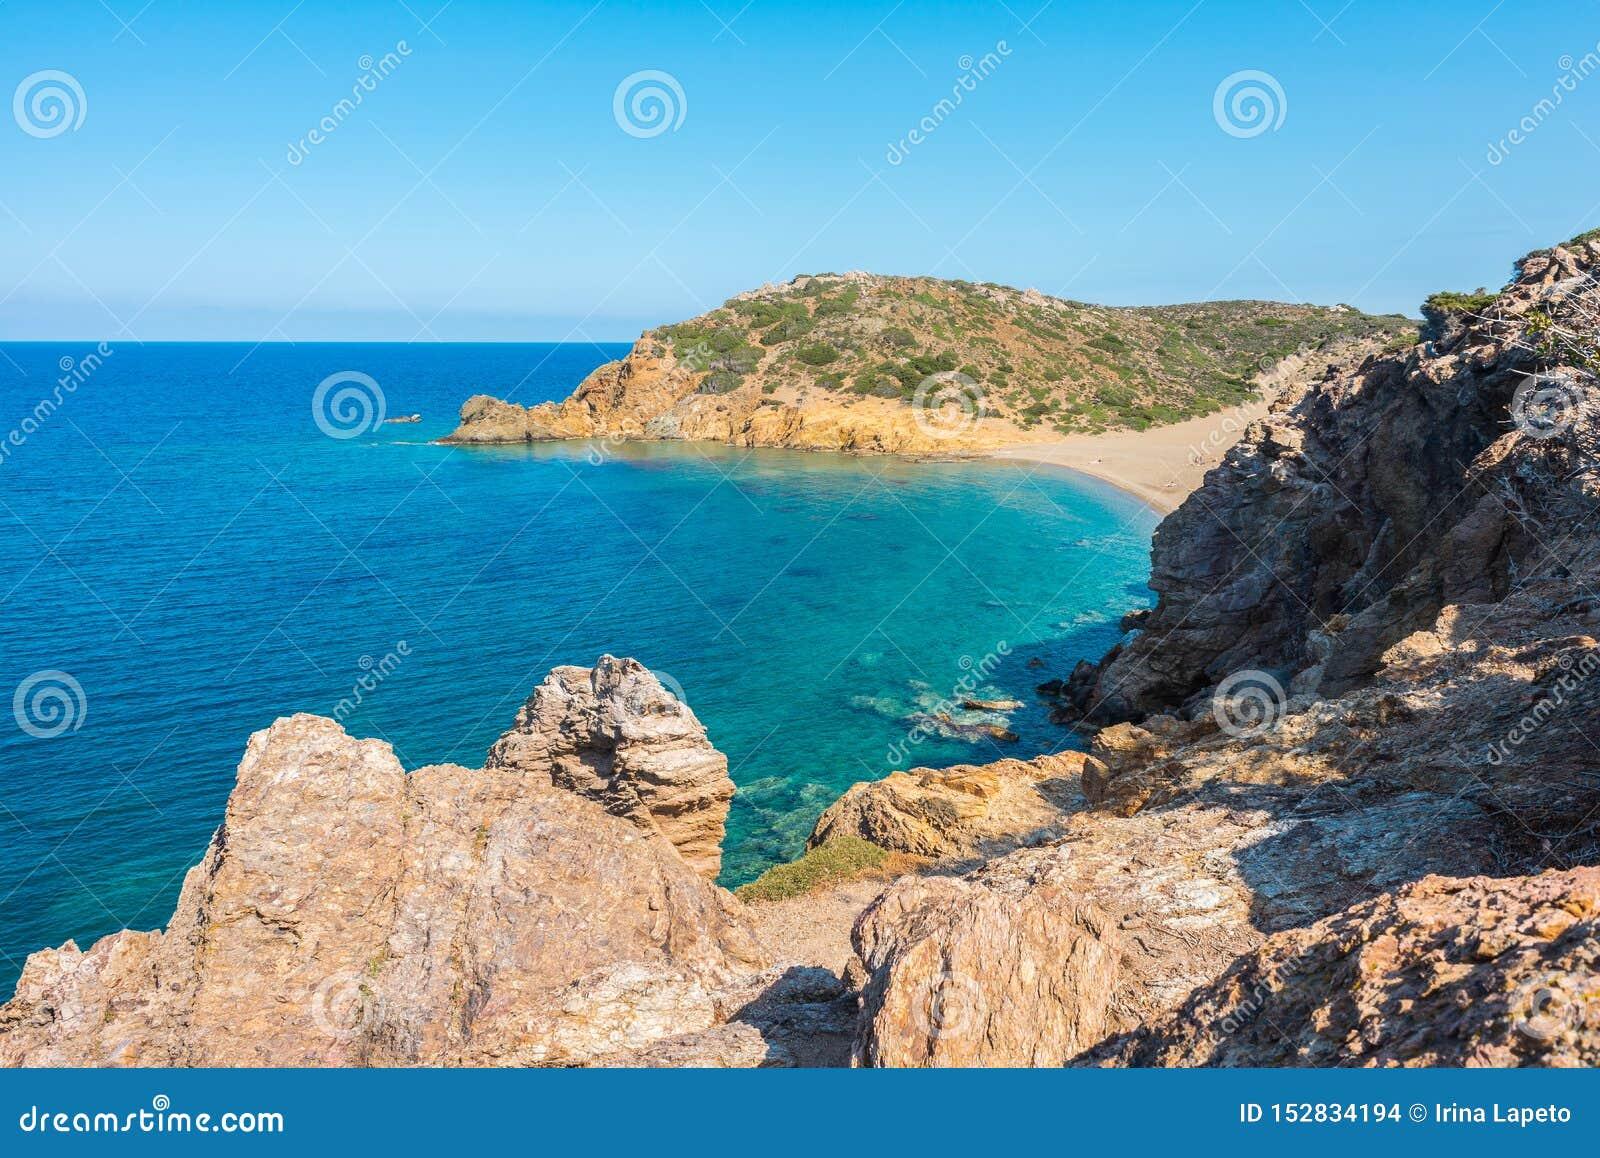 Natural Landscape On The Crete Island Greece Vai Beach